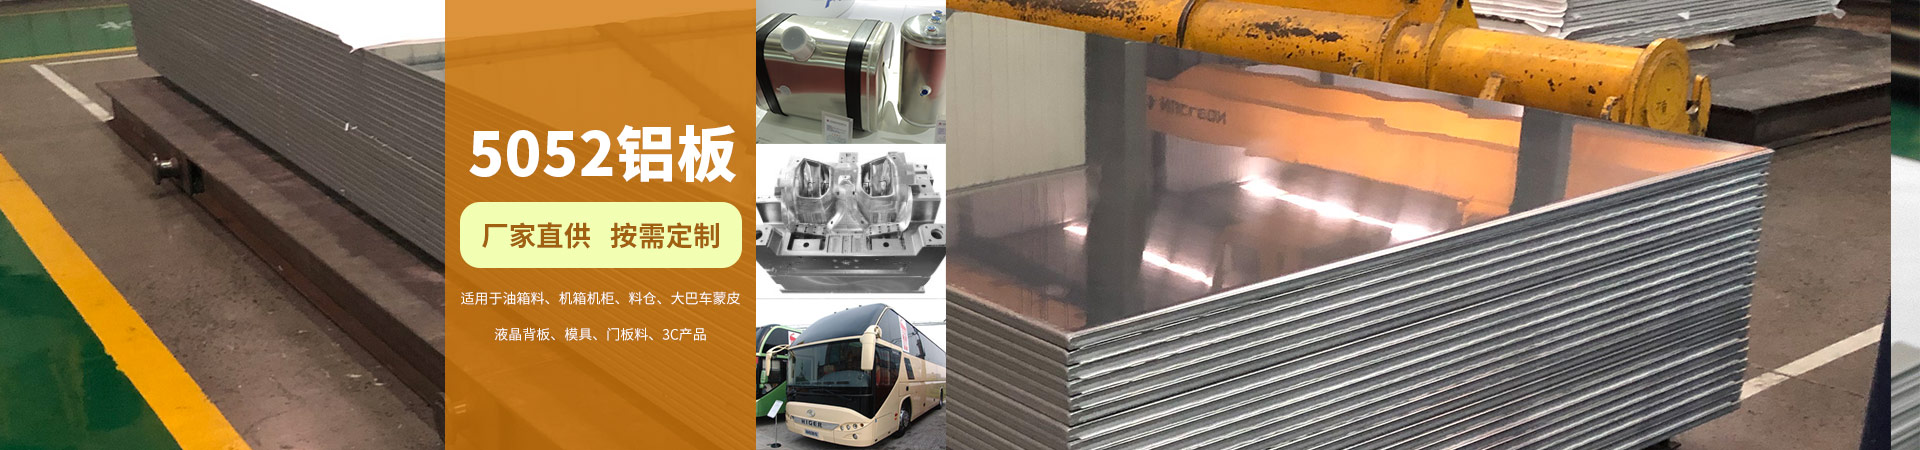 2650mm超寬超厚鋁板